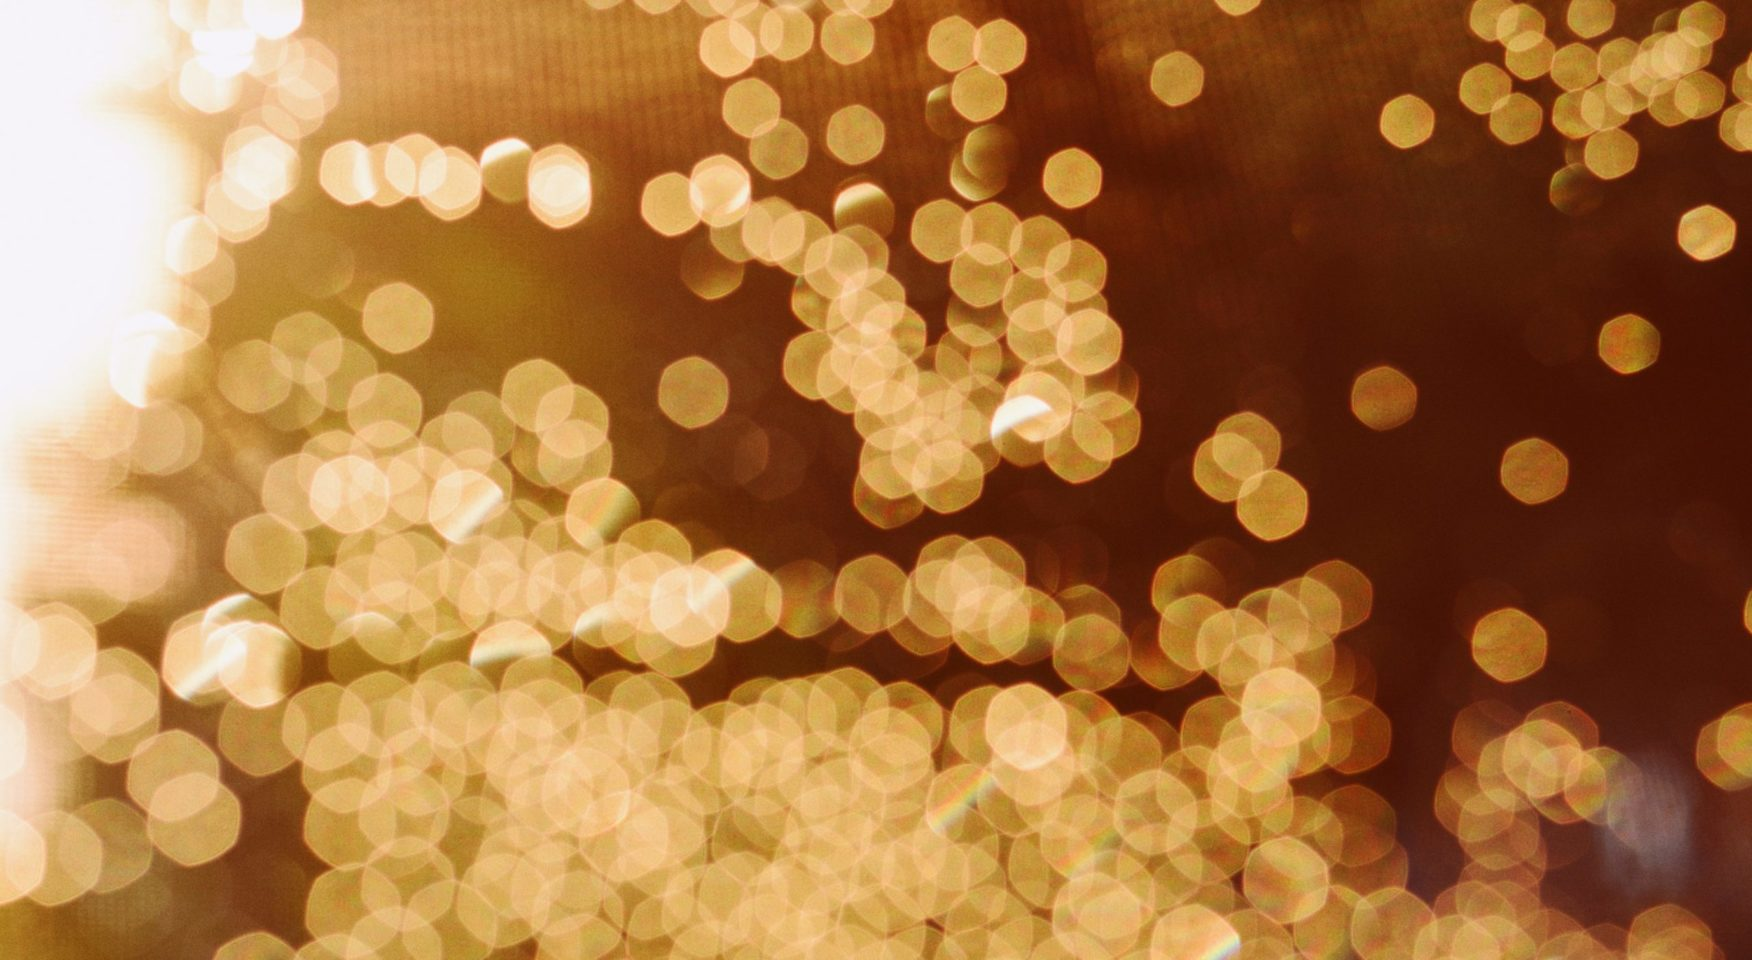 Blurry golden sparkles